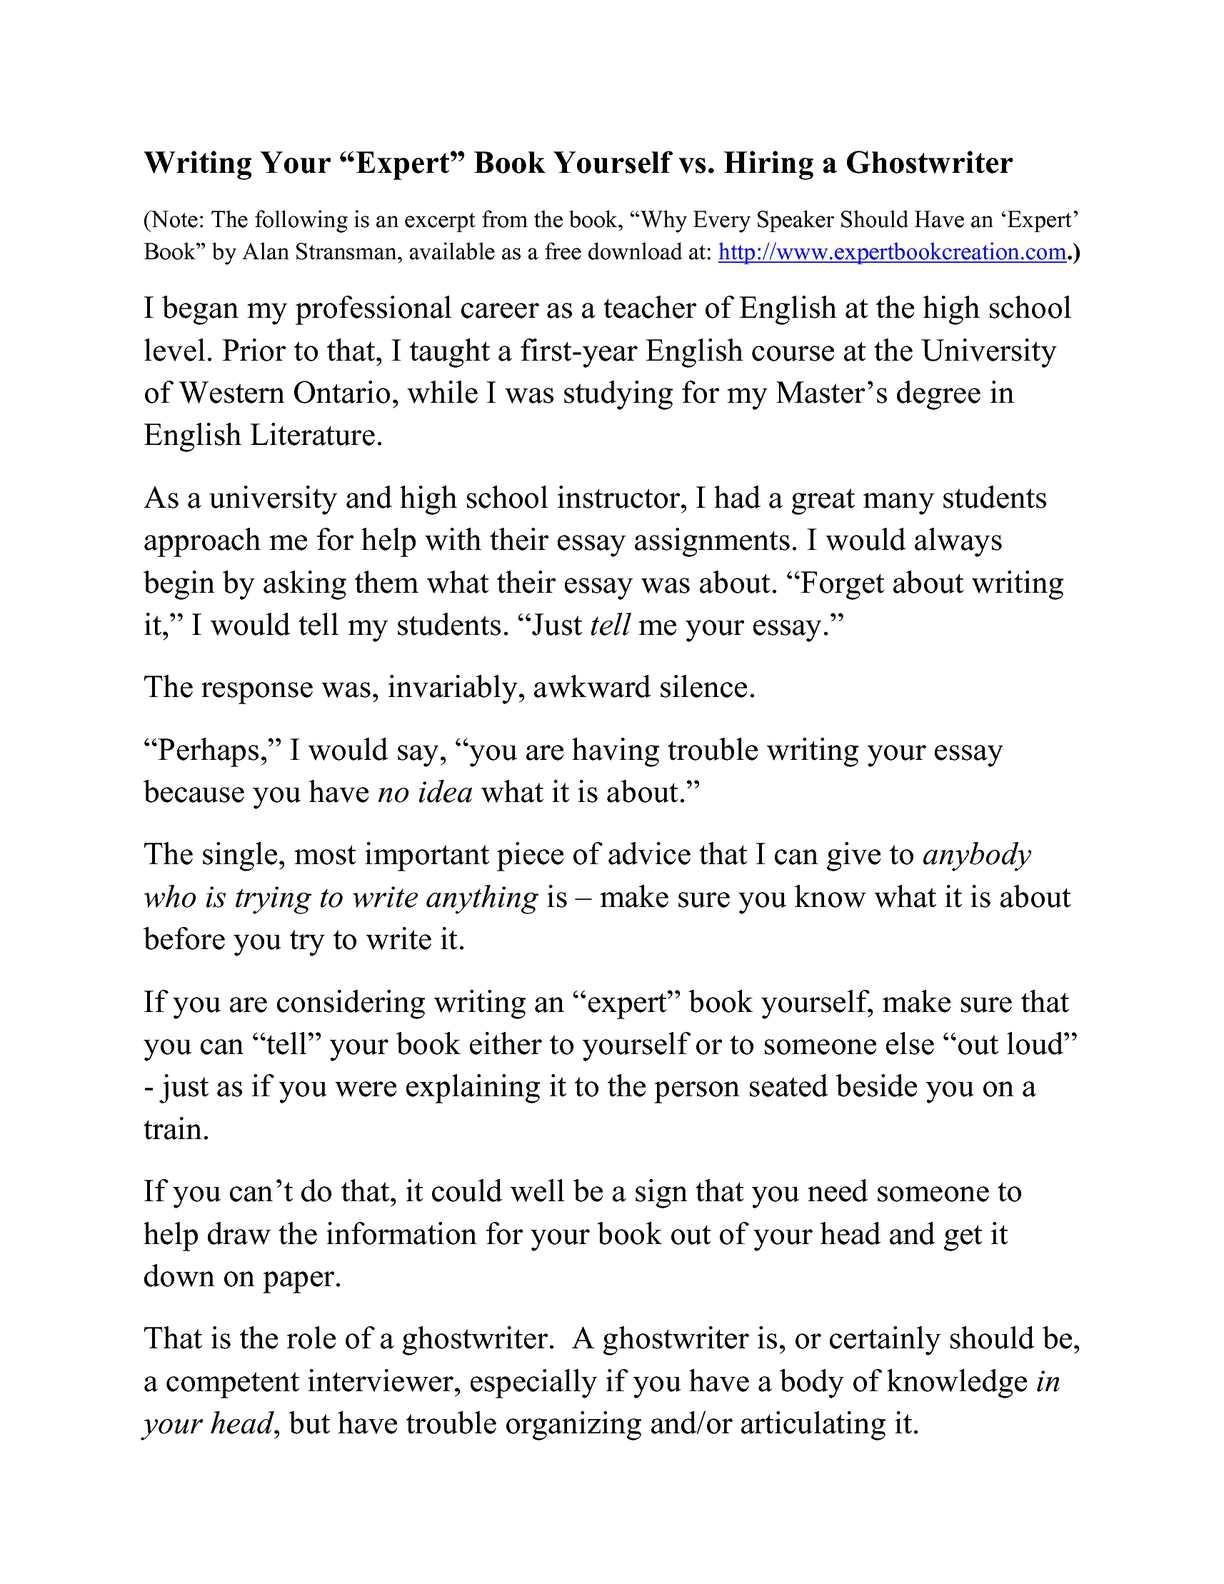 Order essay online essay writing